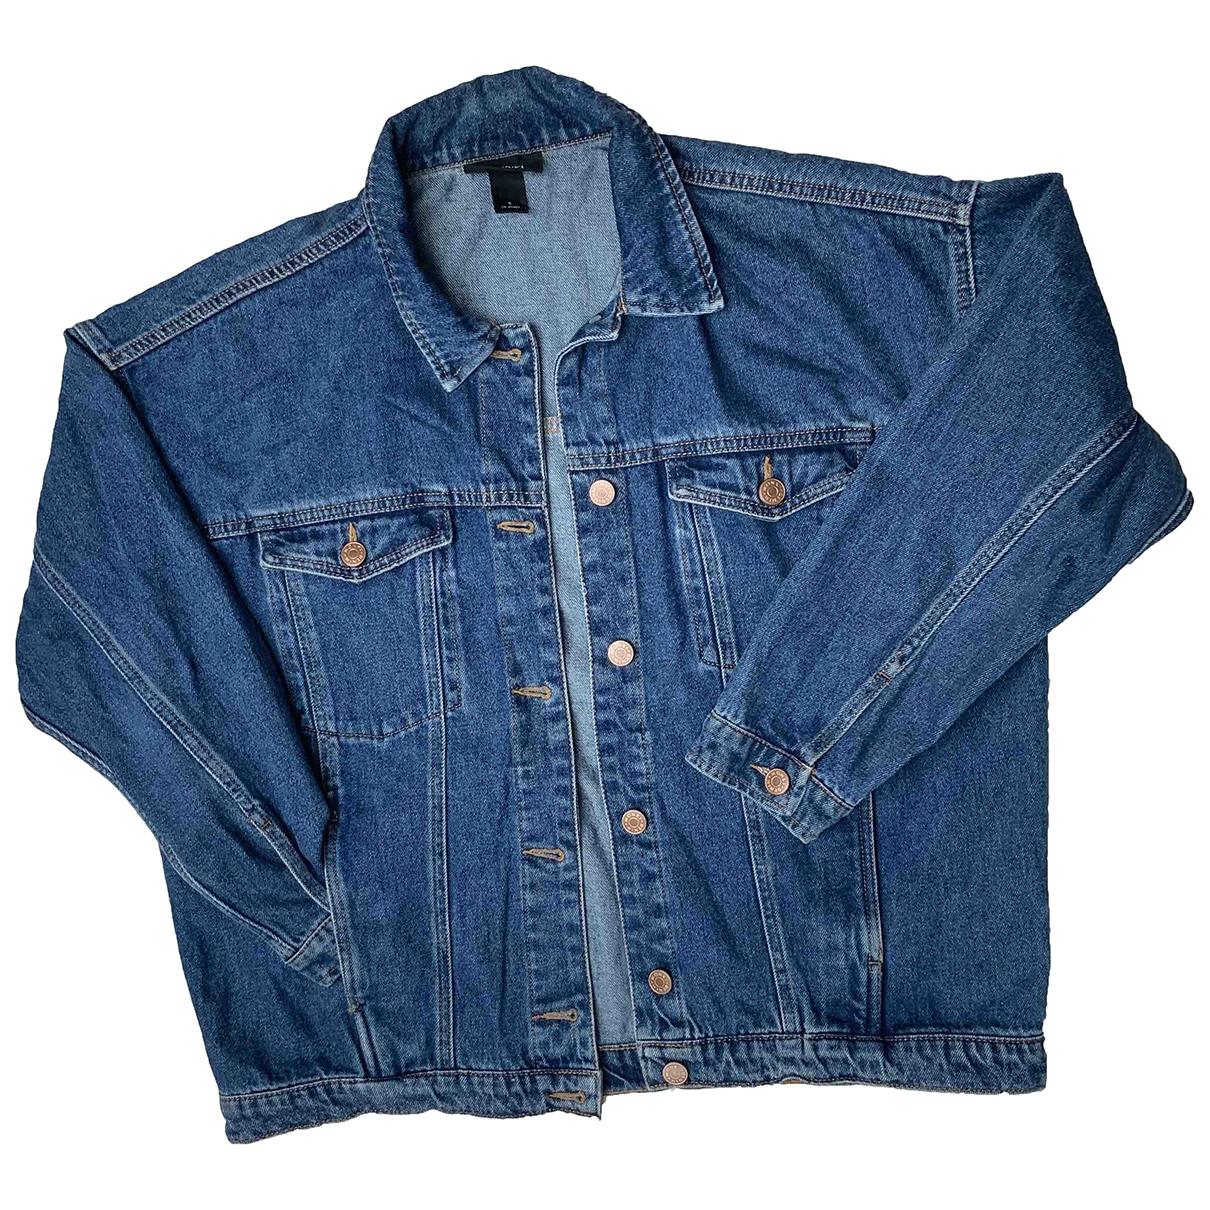 Monki \N Blue Denim - Jeans jacket for Women S International